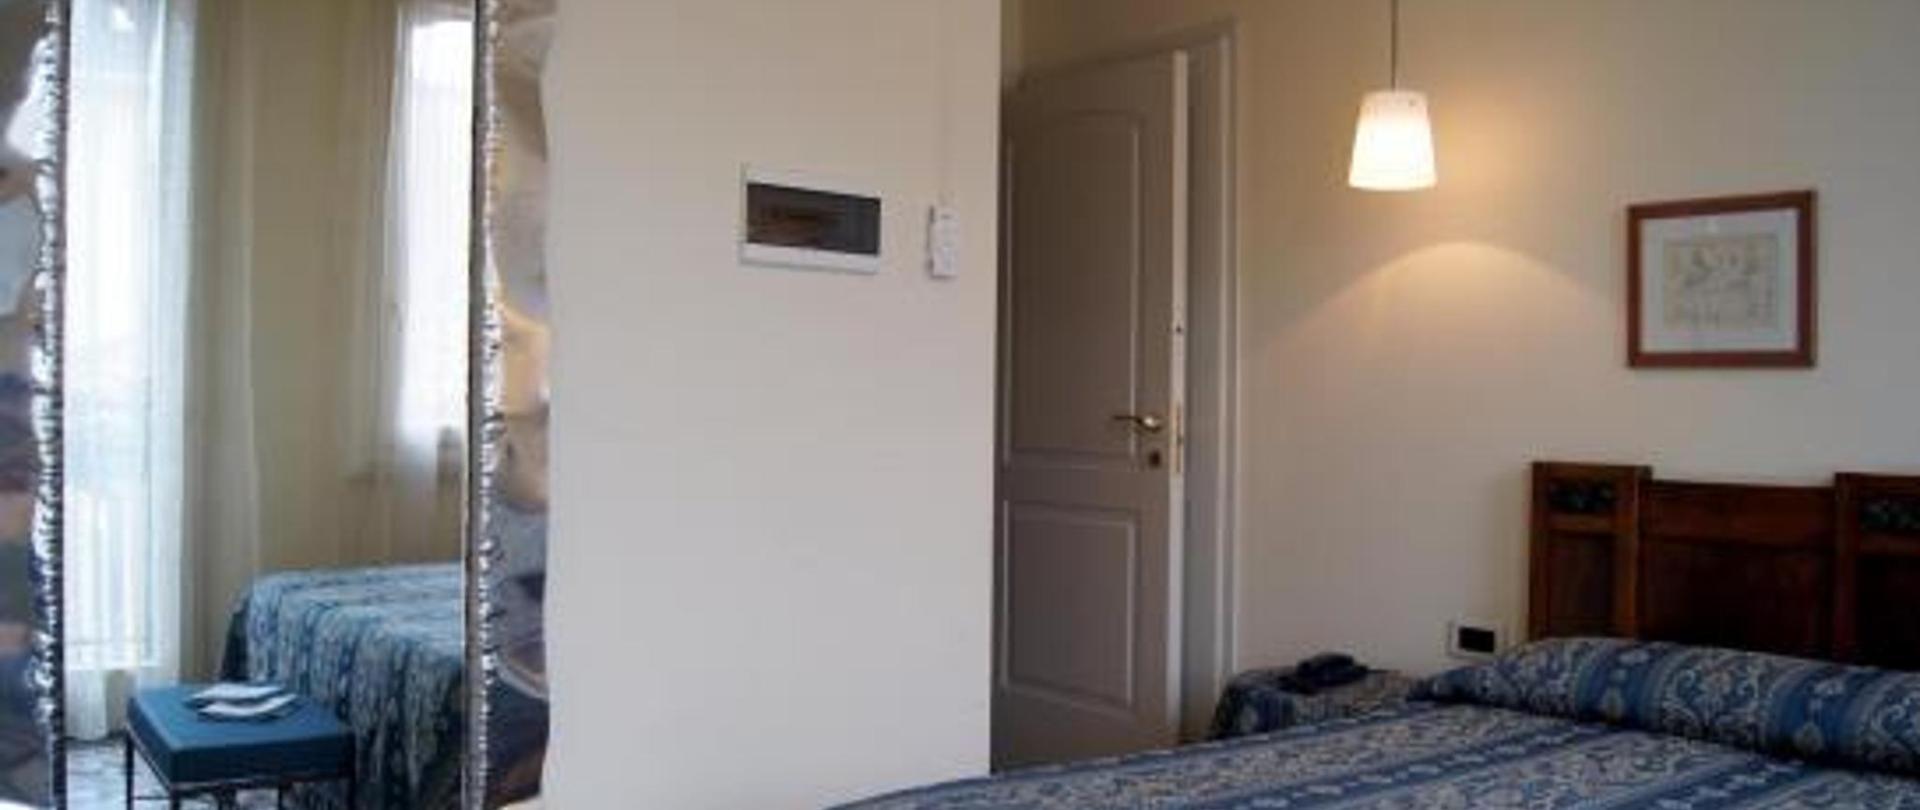 hotel-cristina-vicenza-023.jpg